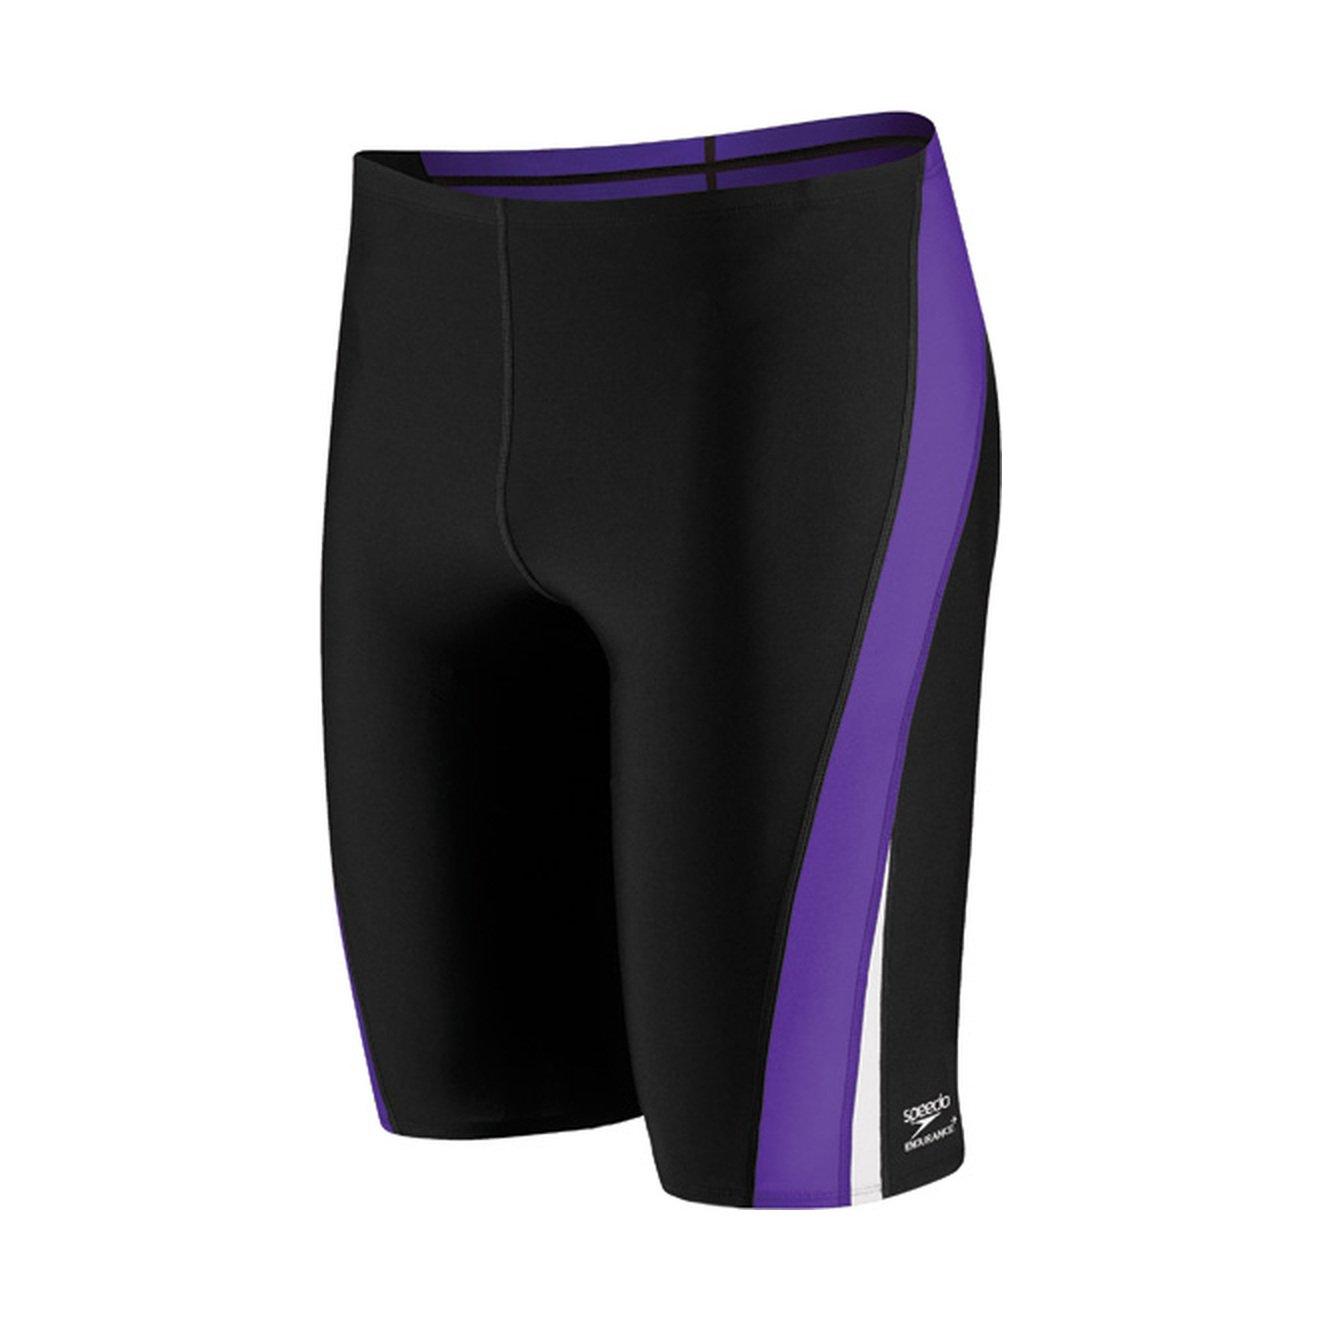 Speedo Men and Boys' Endurance+ Launch Splice Jammer Swimsuit, Black/Purple, 22